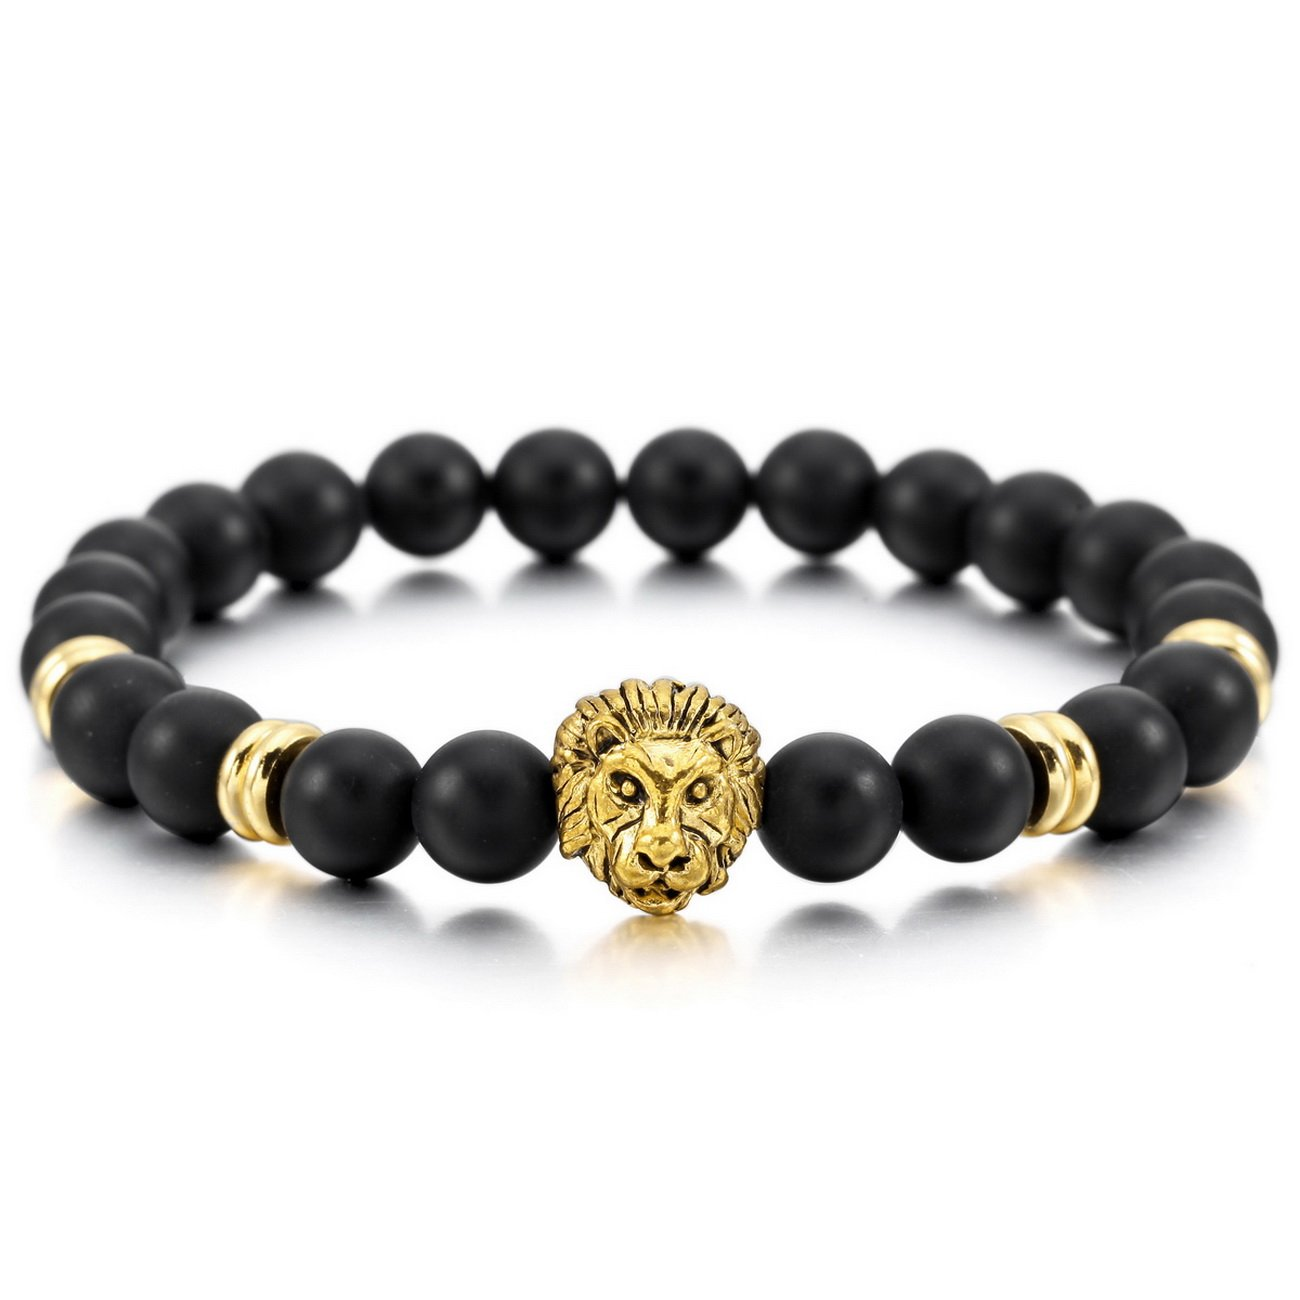 MOWOM Silver Gold Two Tone Black 8mm Wide Alloy Bracelet Bangle Link Wrist Simulated Agate Energy Stone Buddha Mala Bead Elastic ca5020126